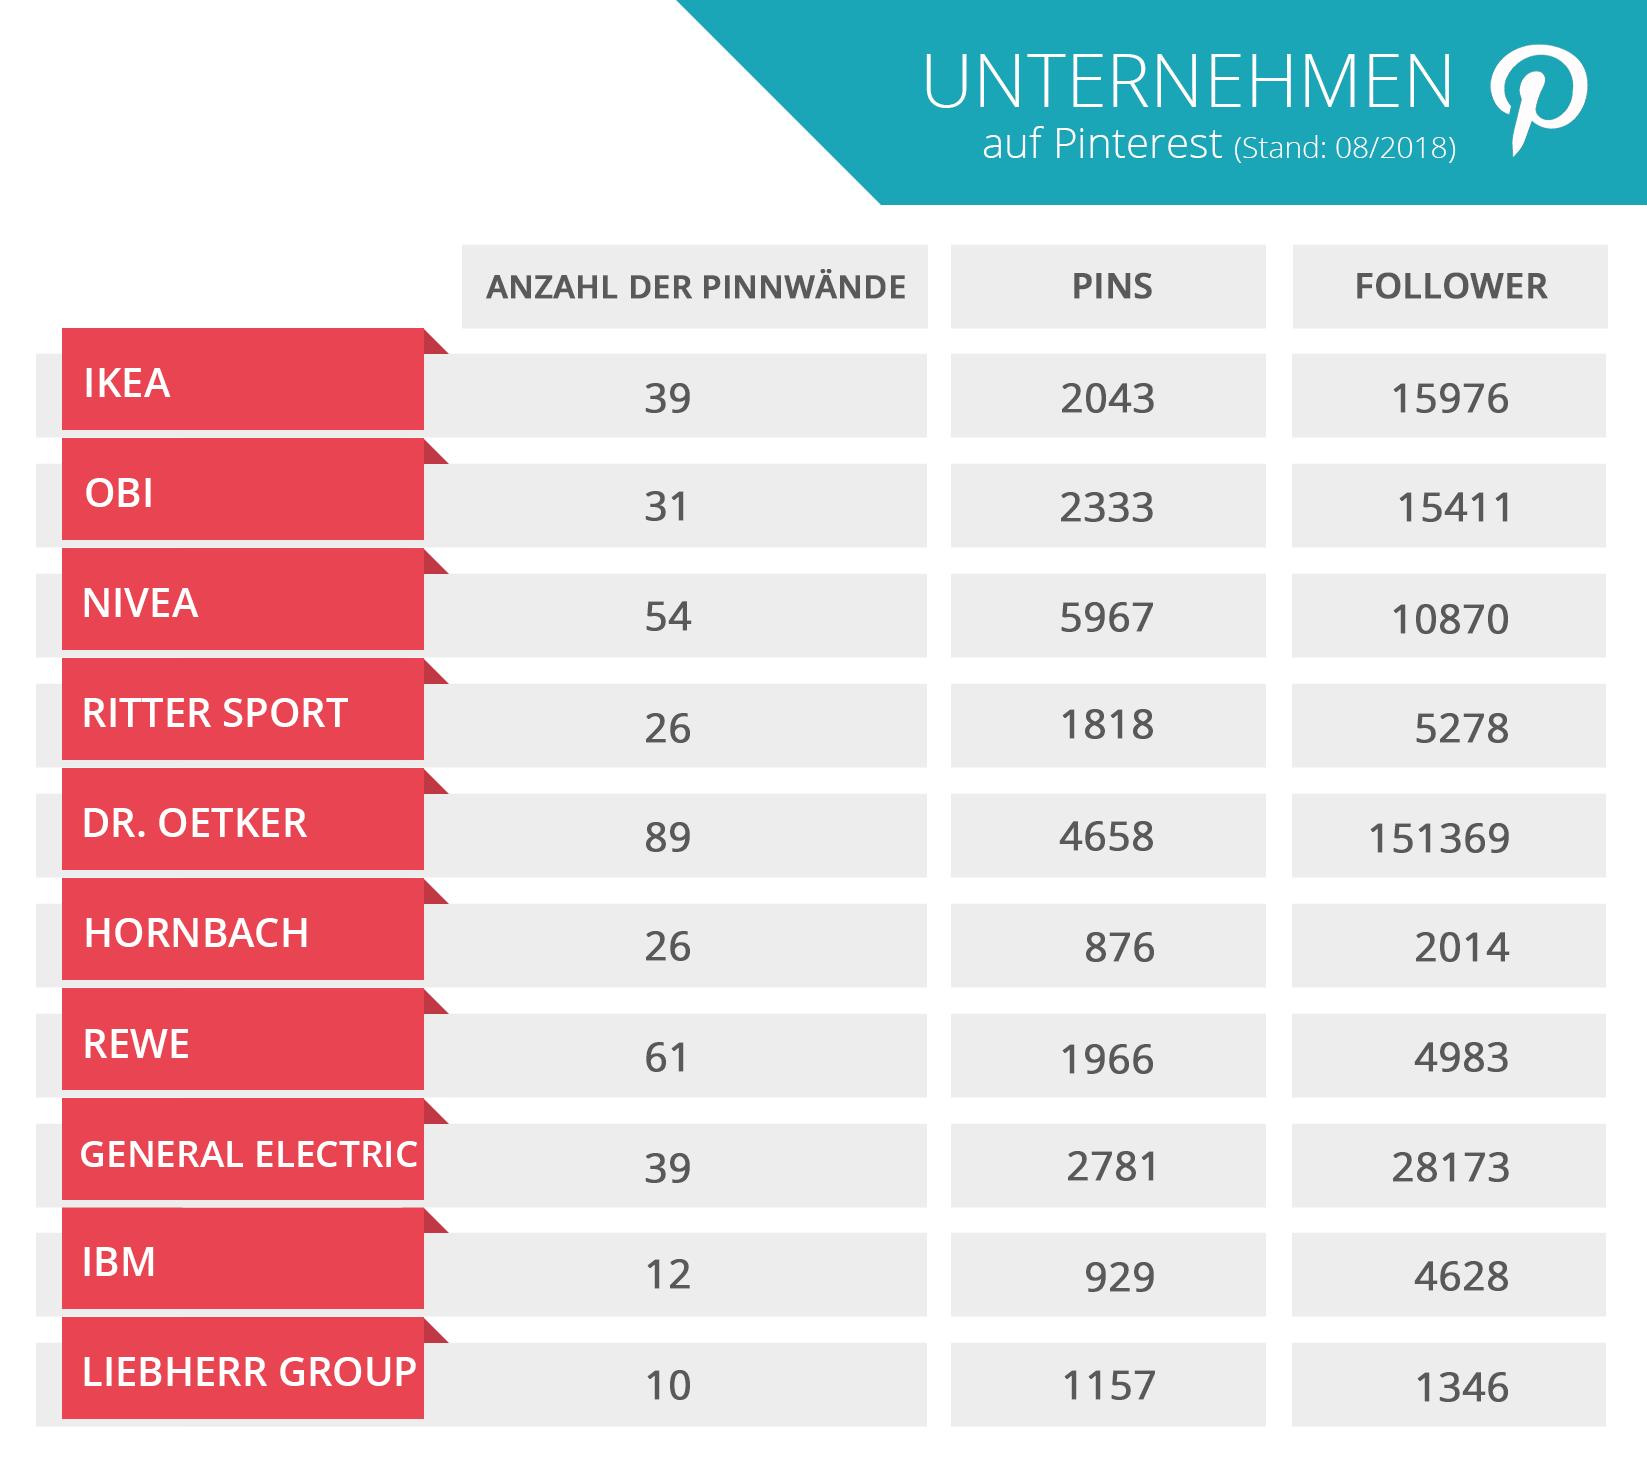 Pinterest_Unternehmen_Statistik